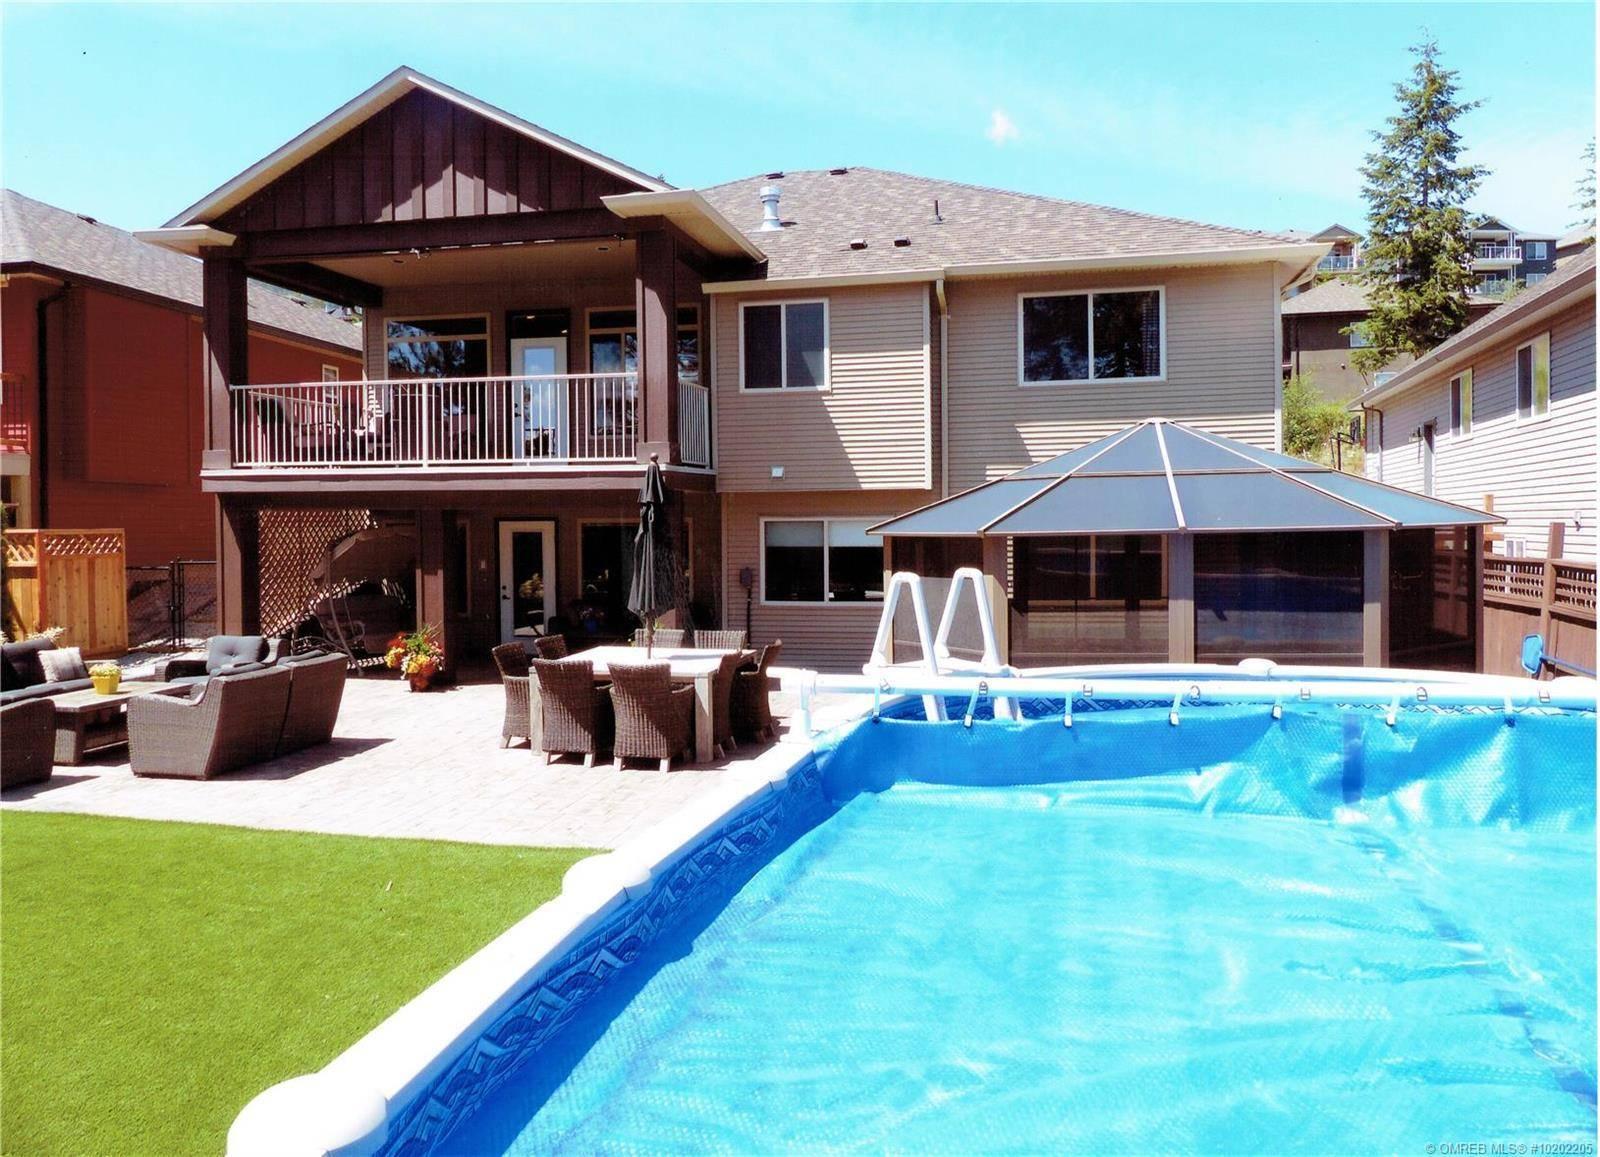 House for sale at 1933 Rosealee Ln West Kelowna British Columbia - MLS: 10202205